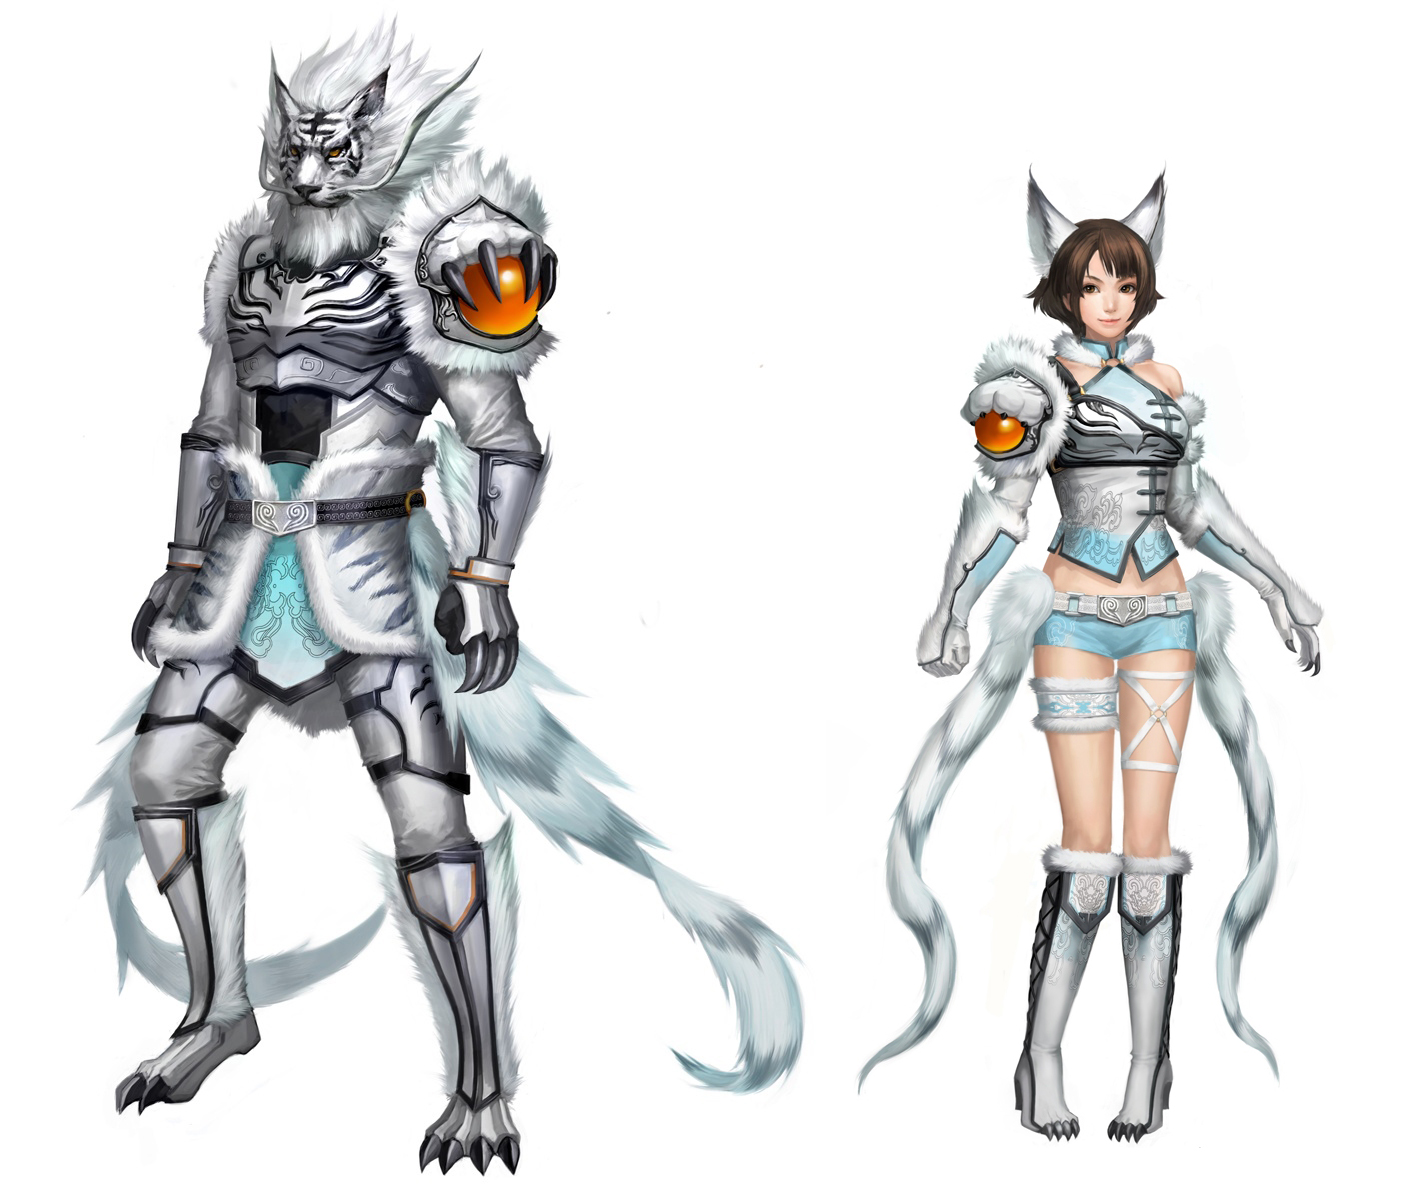 Warriors Orochi 4 Gods: Byakkoclothes-dwonline.jpg